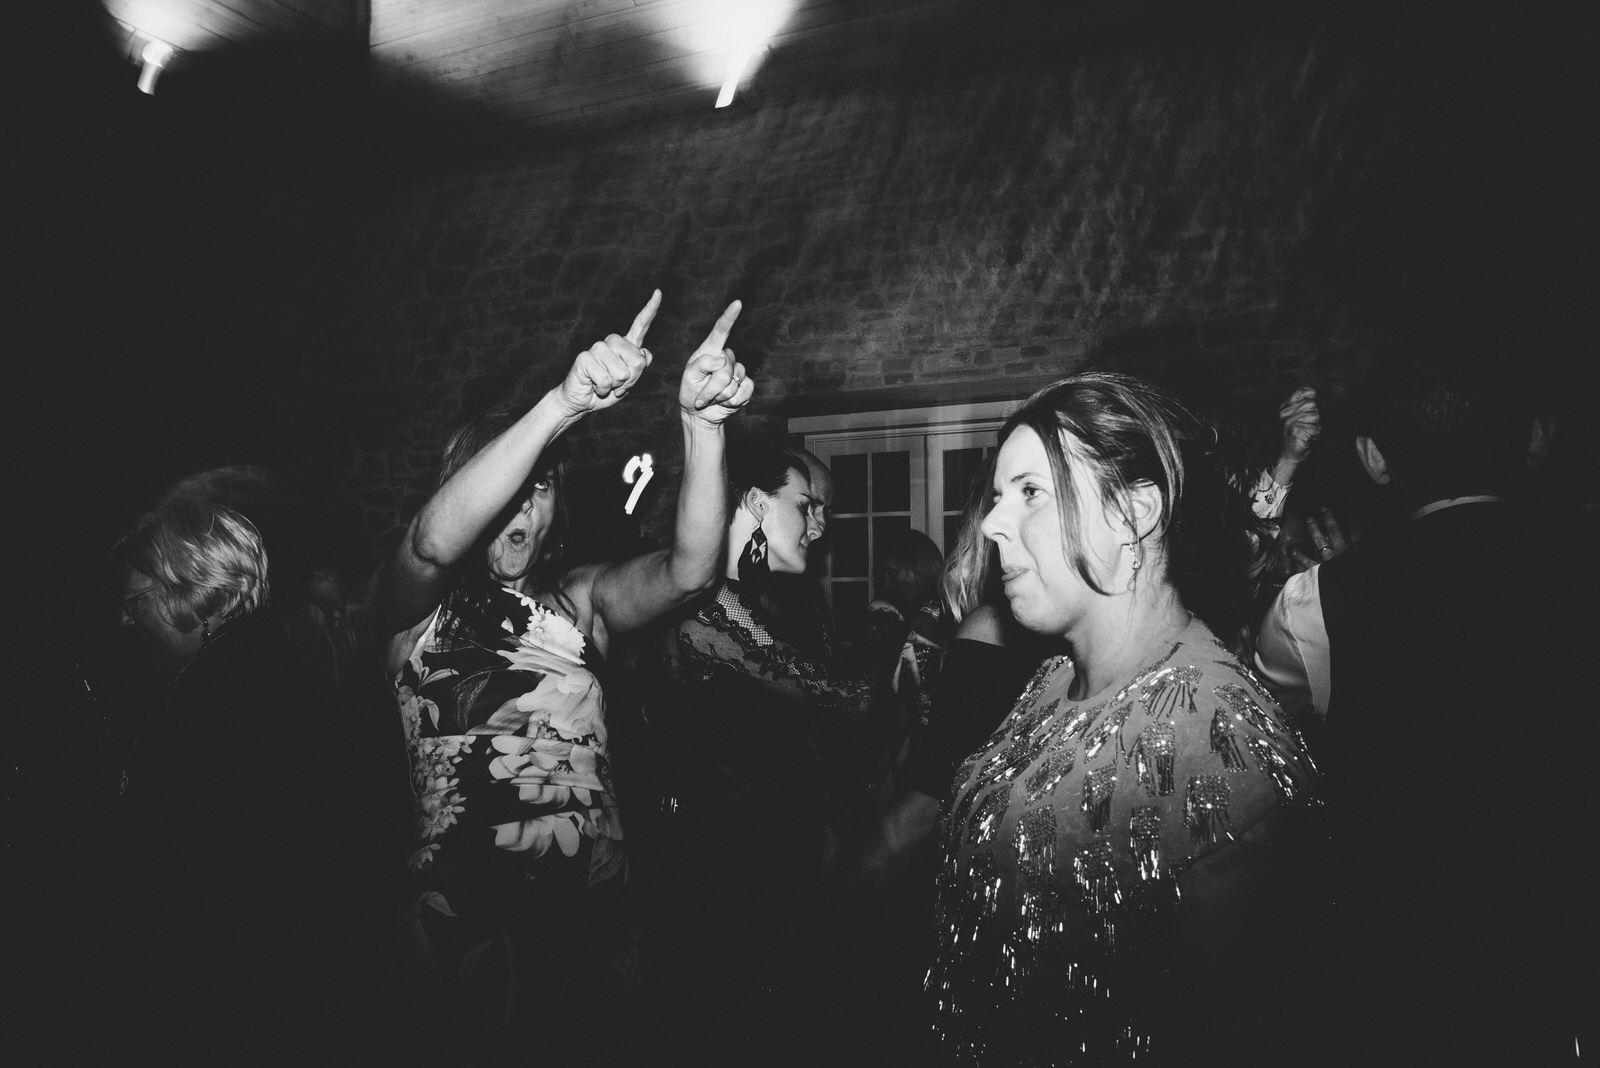 042-COLSTOUN-HOUSE-WEDDING-ALTERNATIVE-WEDDING-PHOTOGRAPHER-GLASGOW-WEDDING-PHOTOGRAPHER-STYLISH-SCOTTISH-WEDDING.JPG